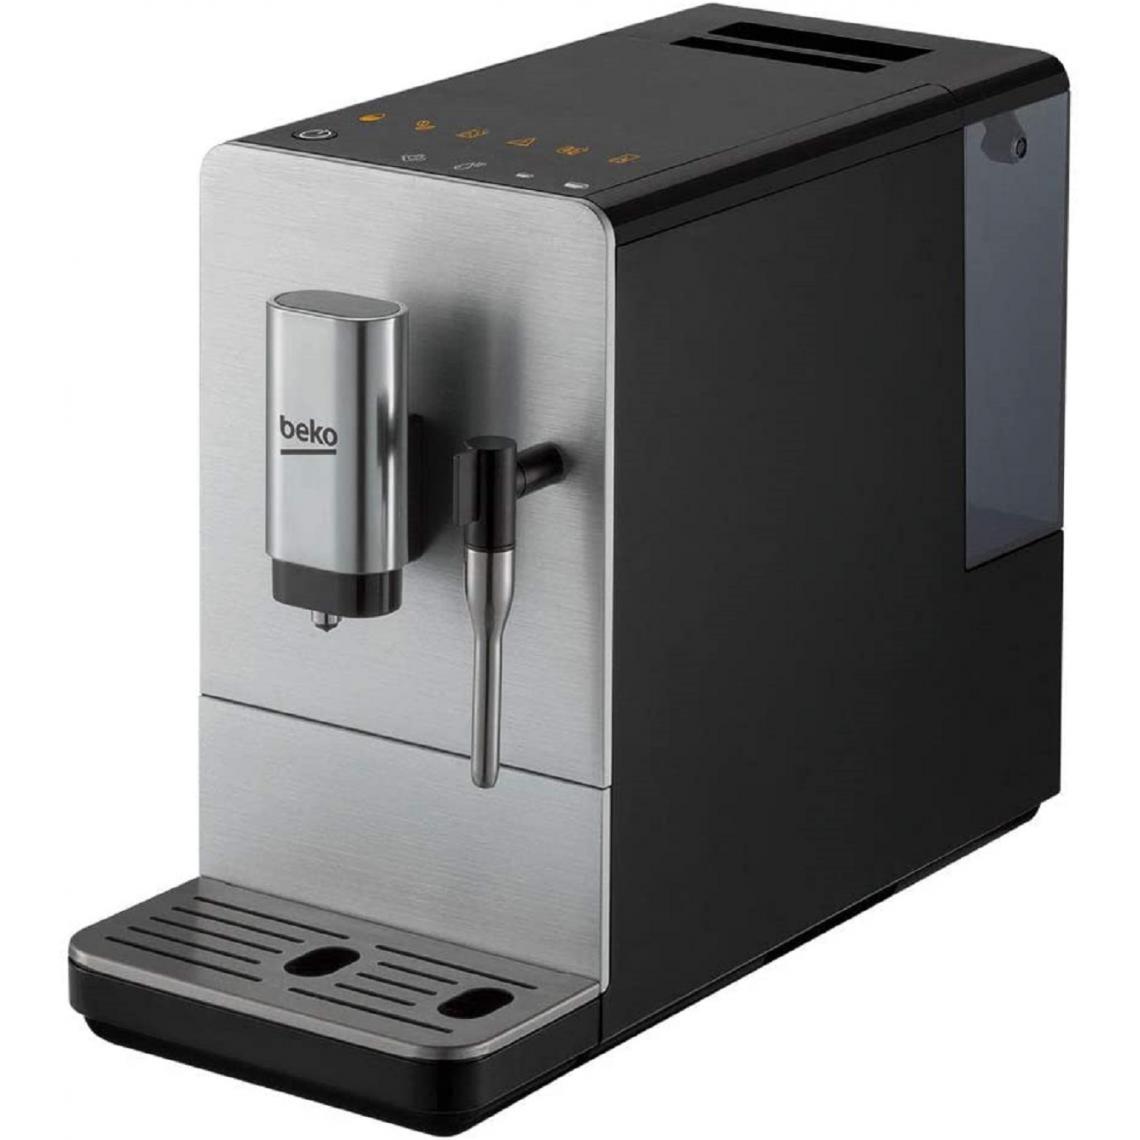 Beko Machine à café Expresso broyeur CEG5311X - Gris